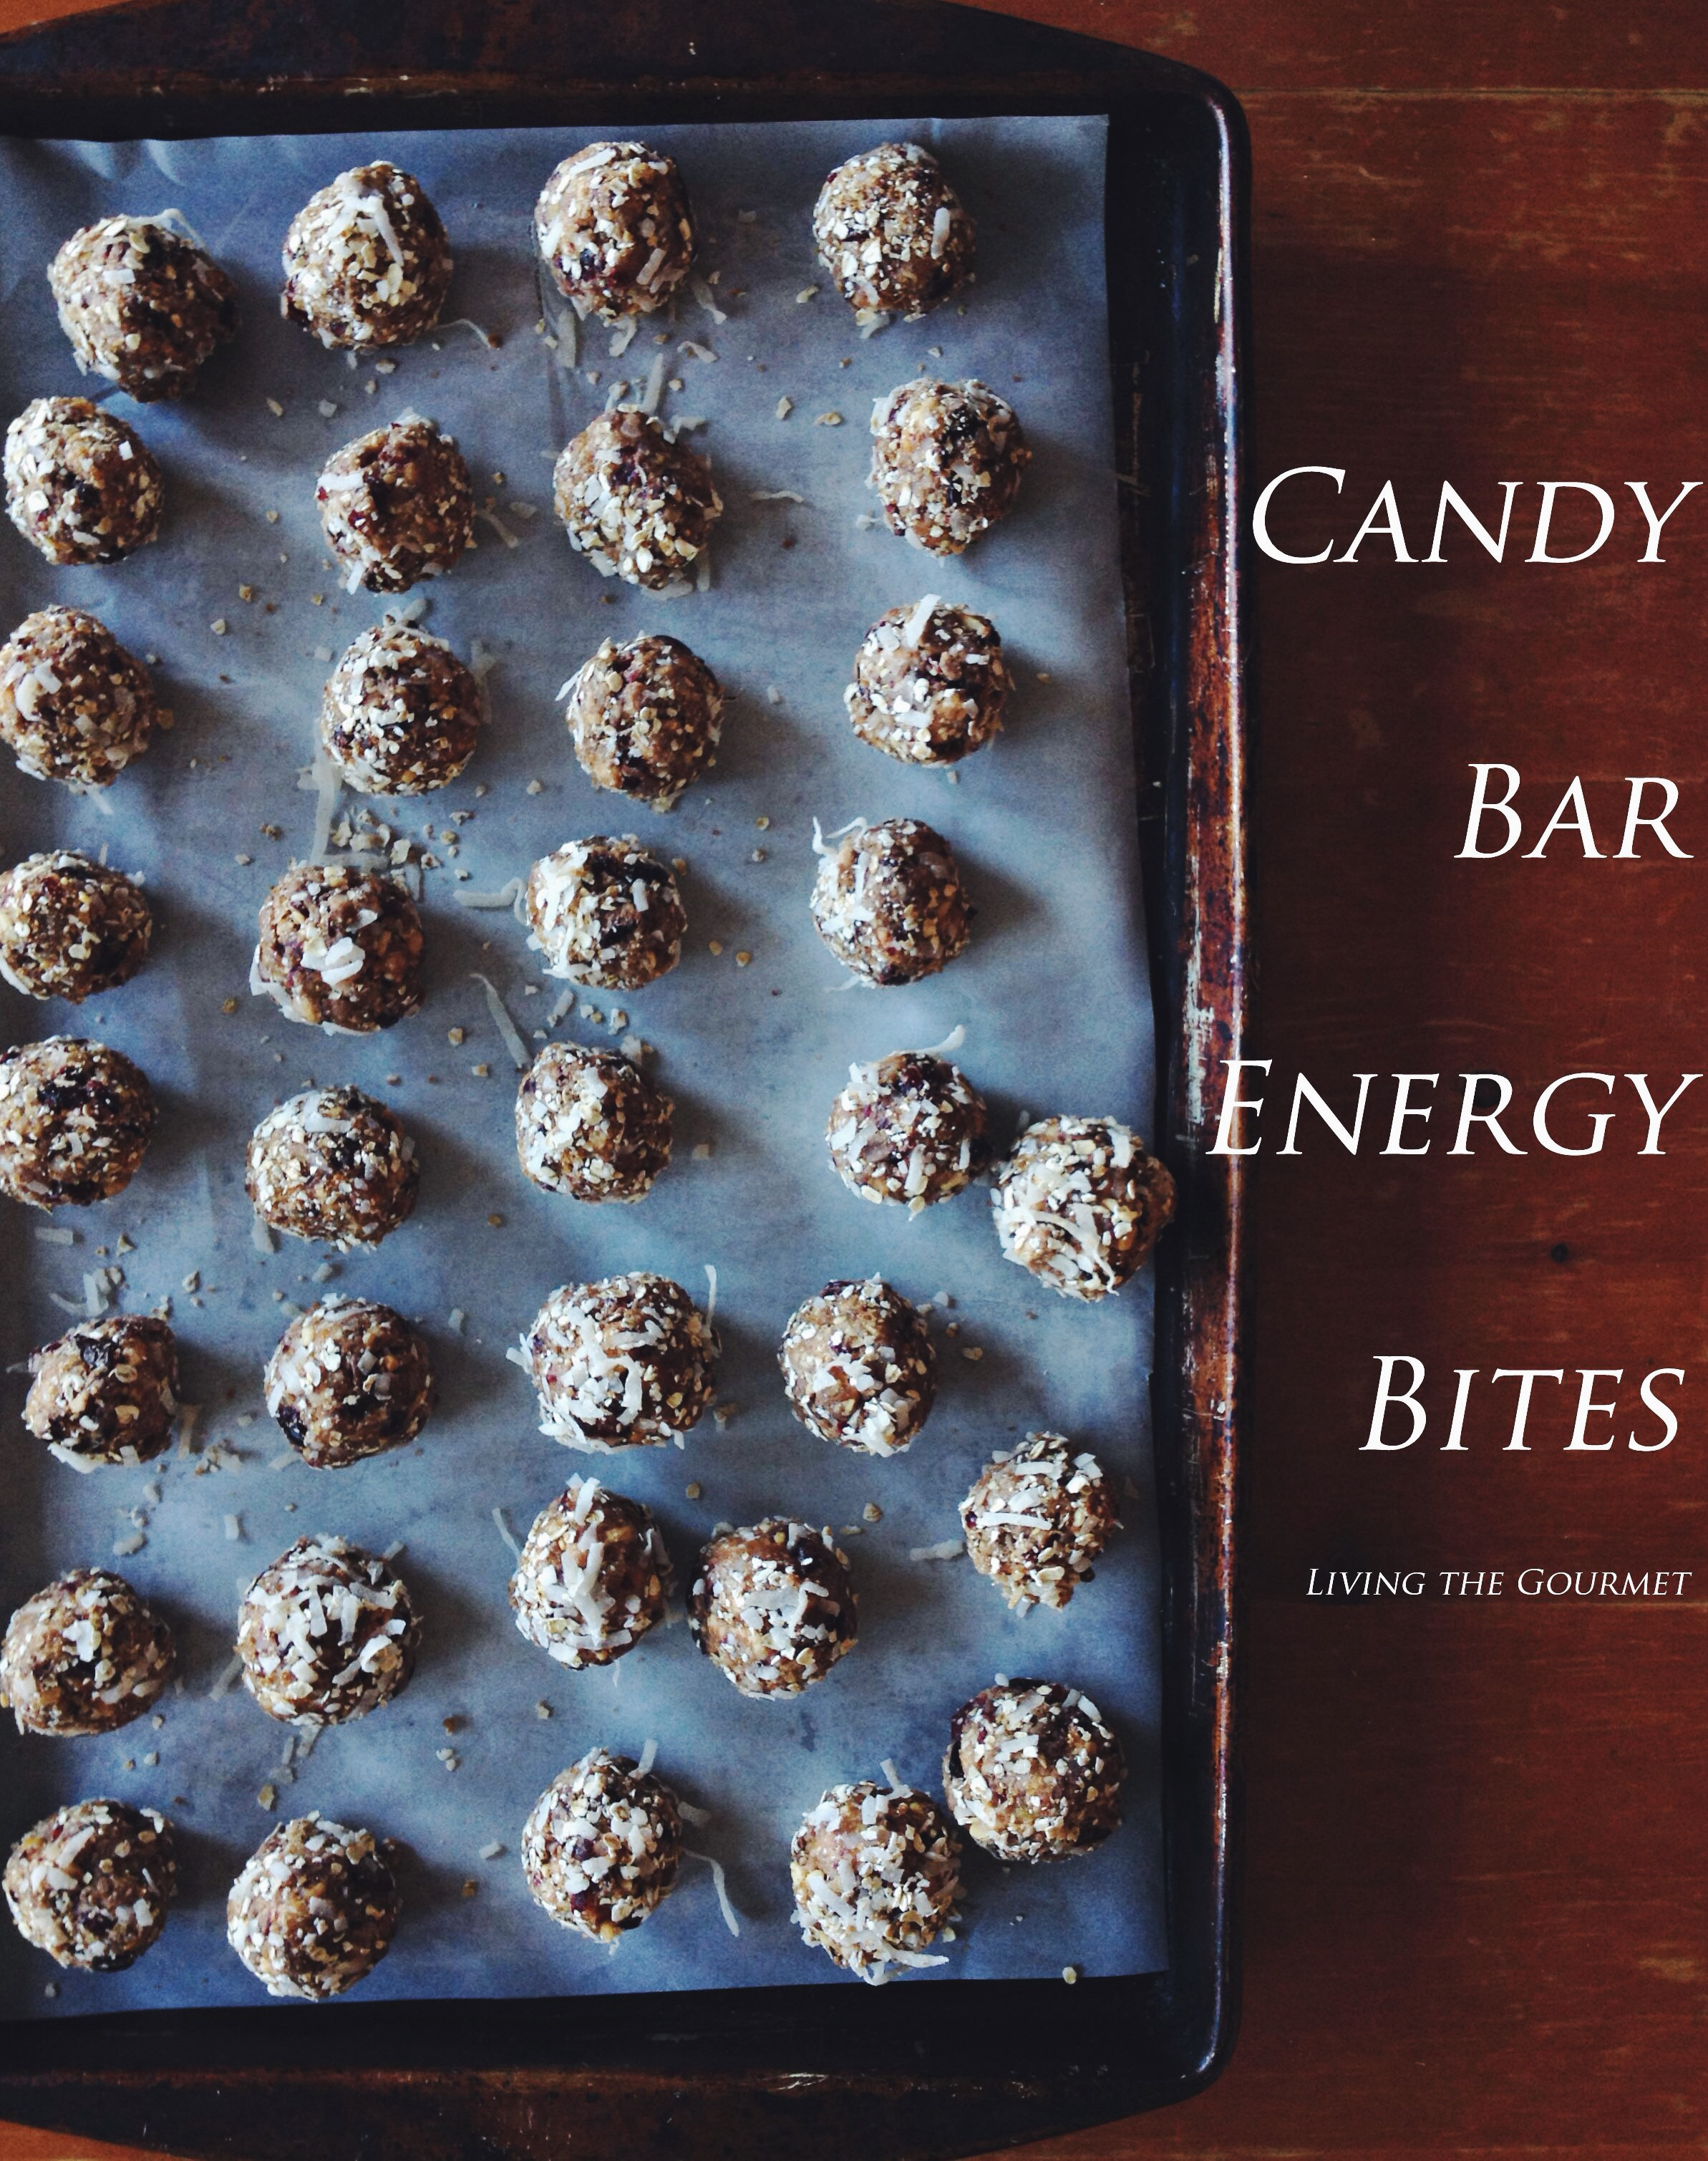 Living the Gourmet: Candy Bar Energy Bites